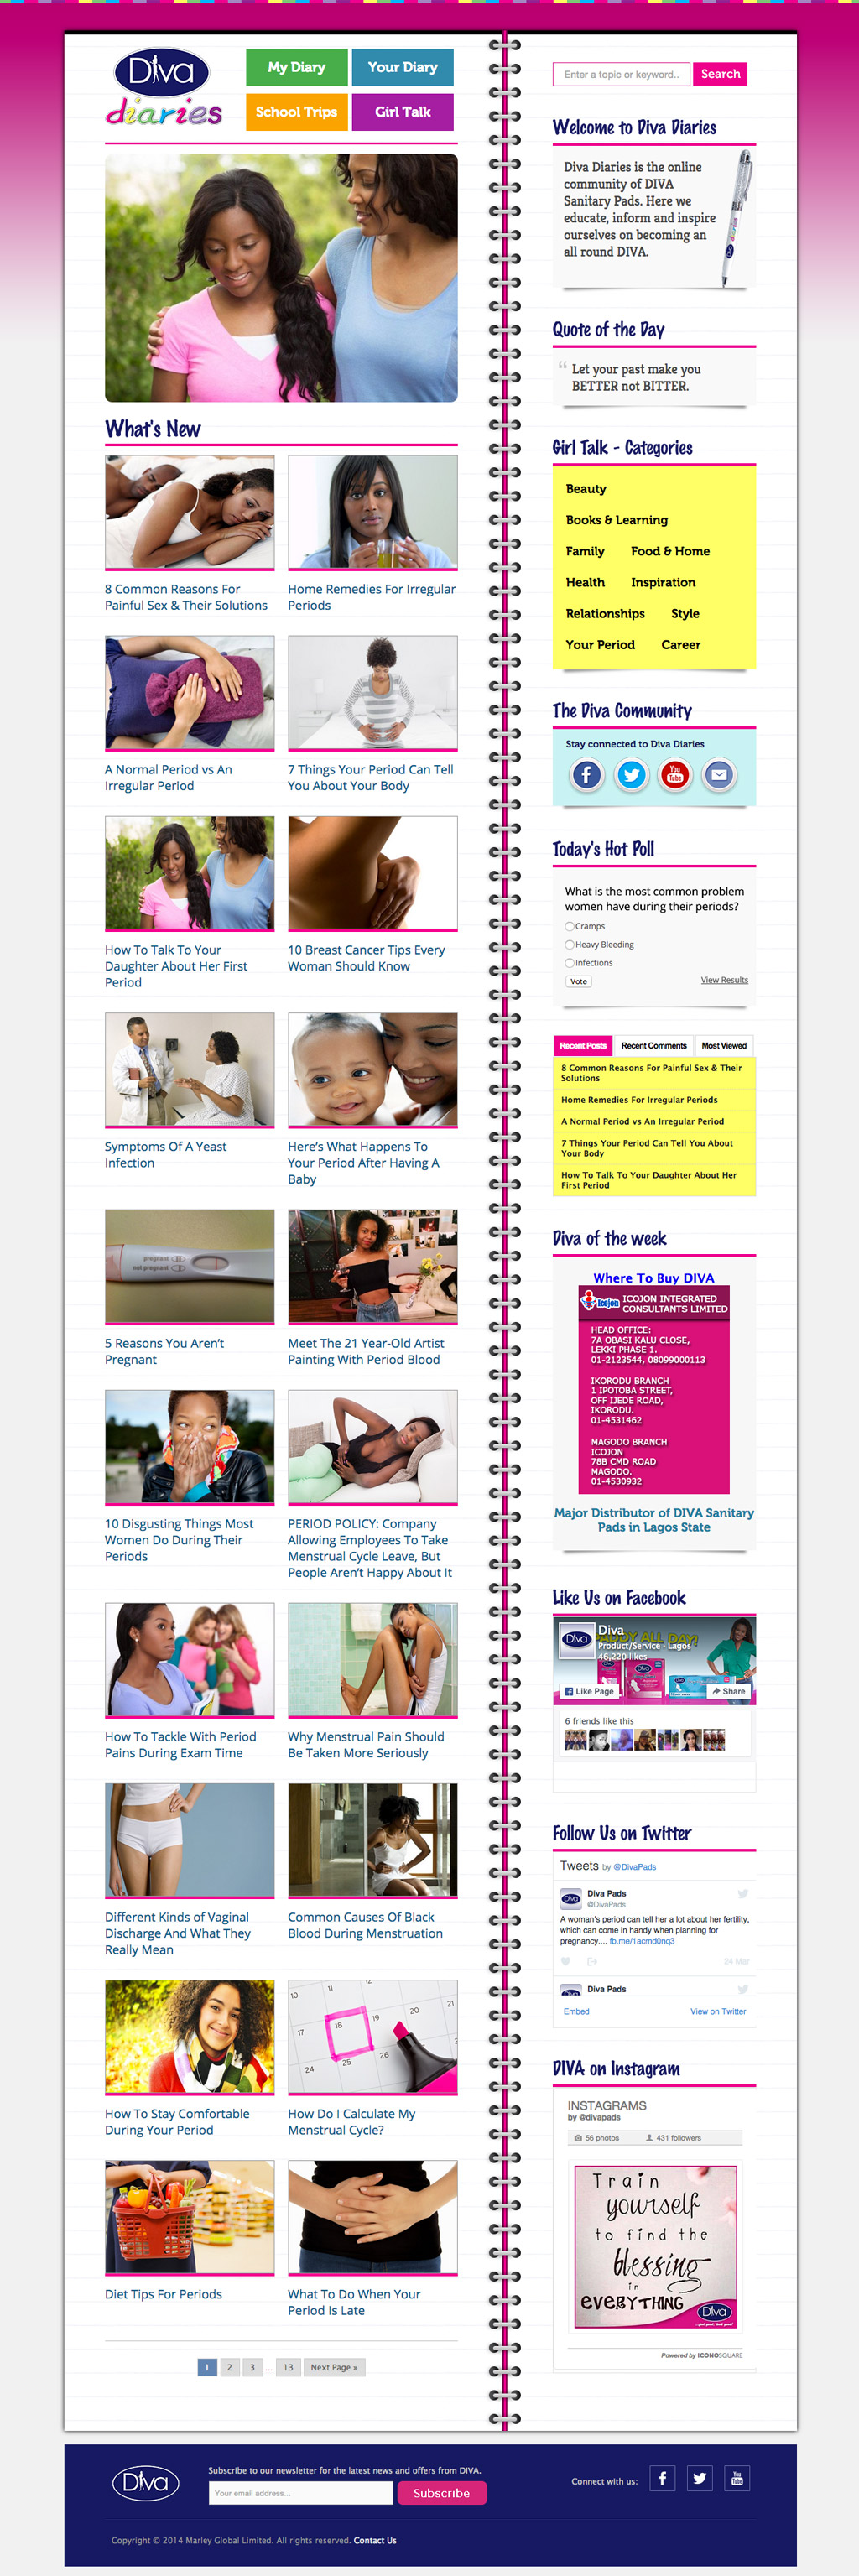 diva-diaries-blog-design-and-development